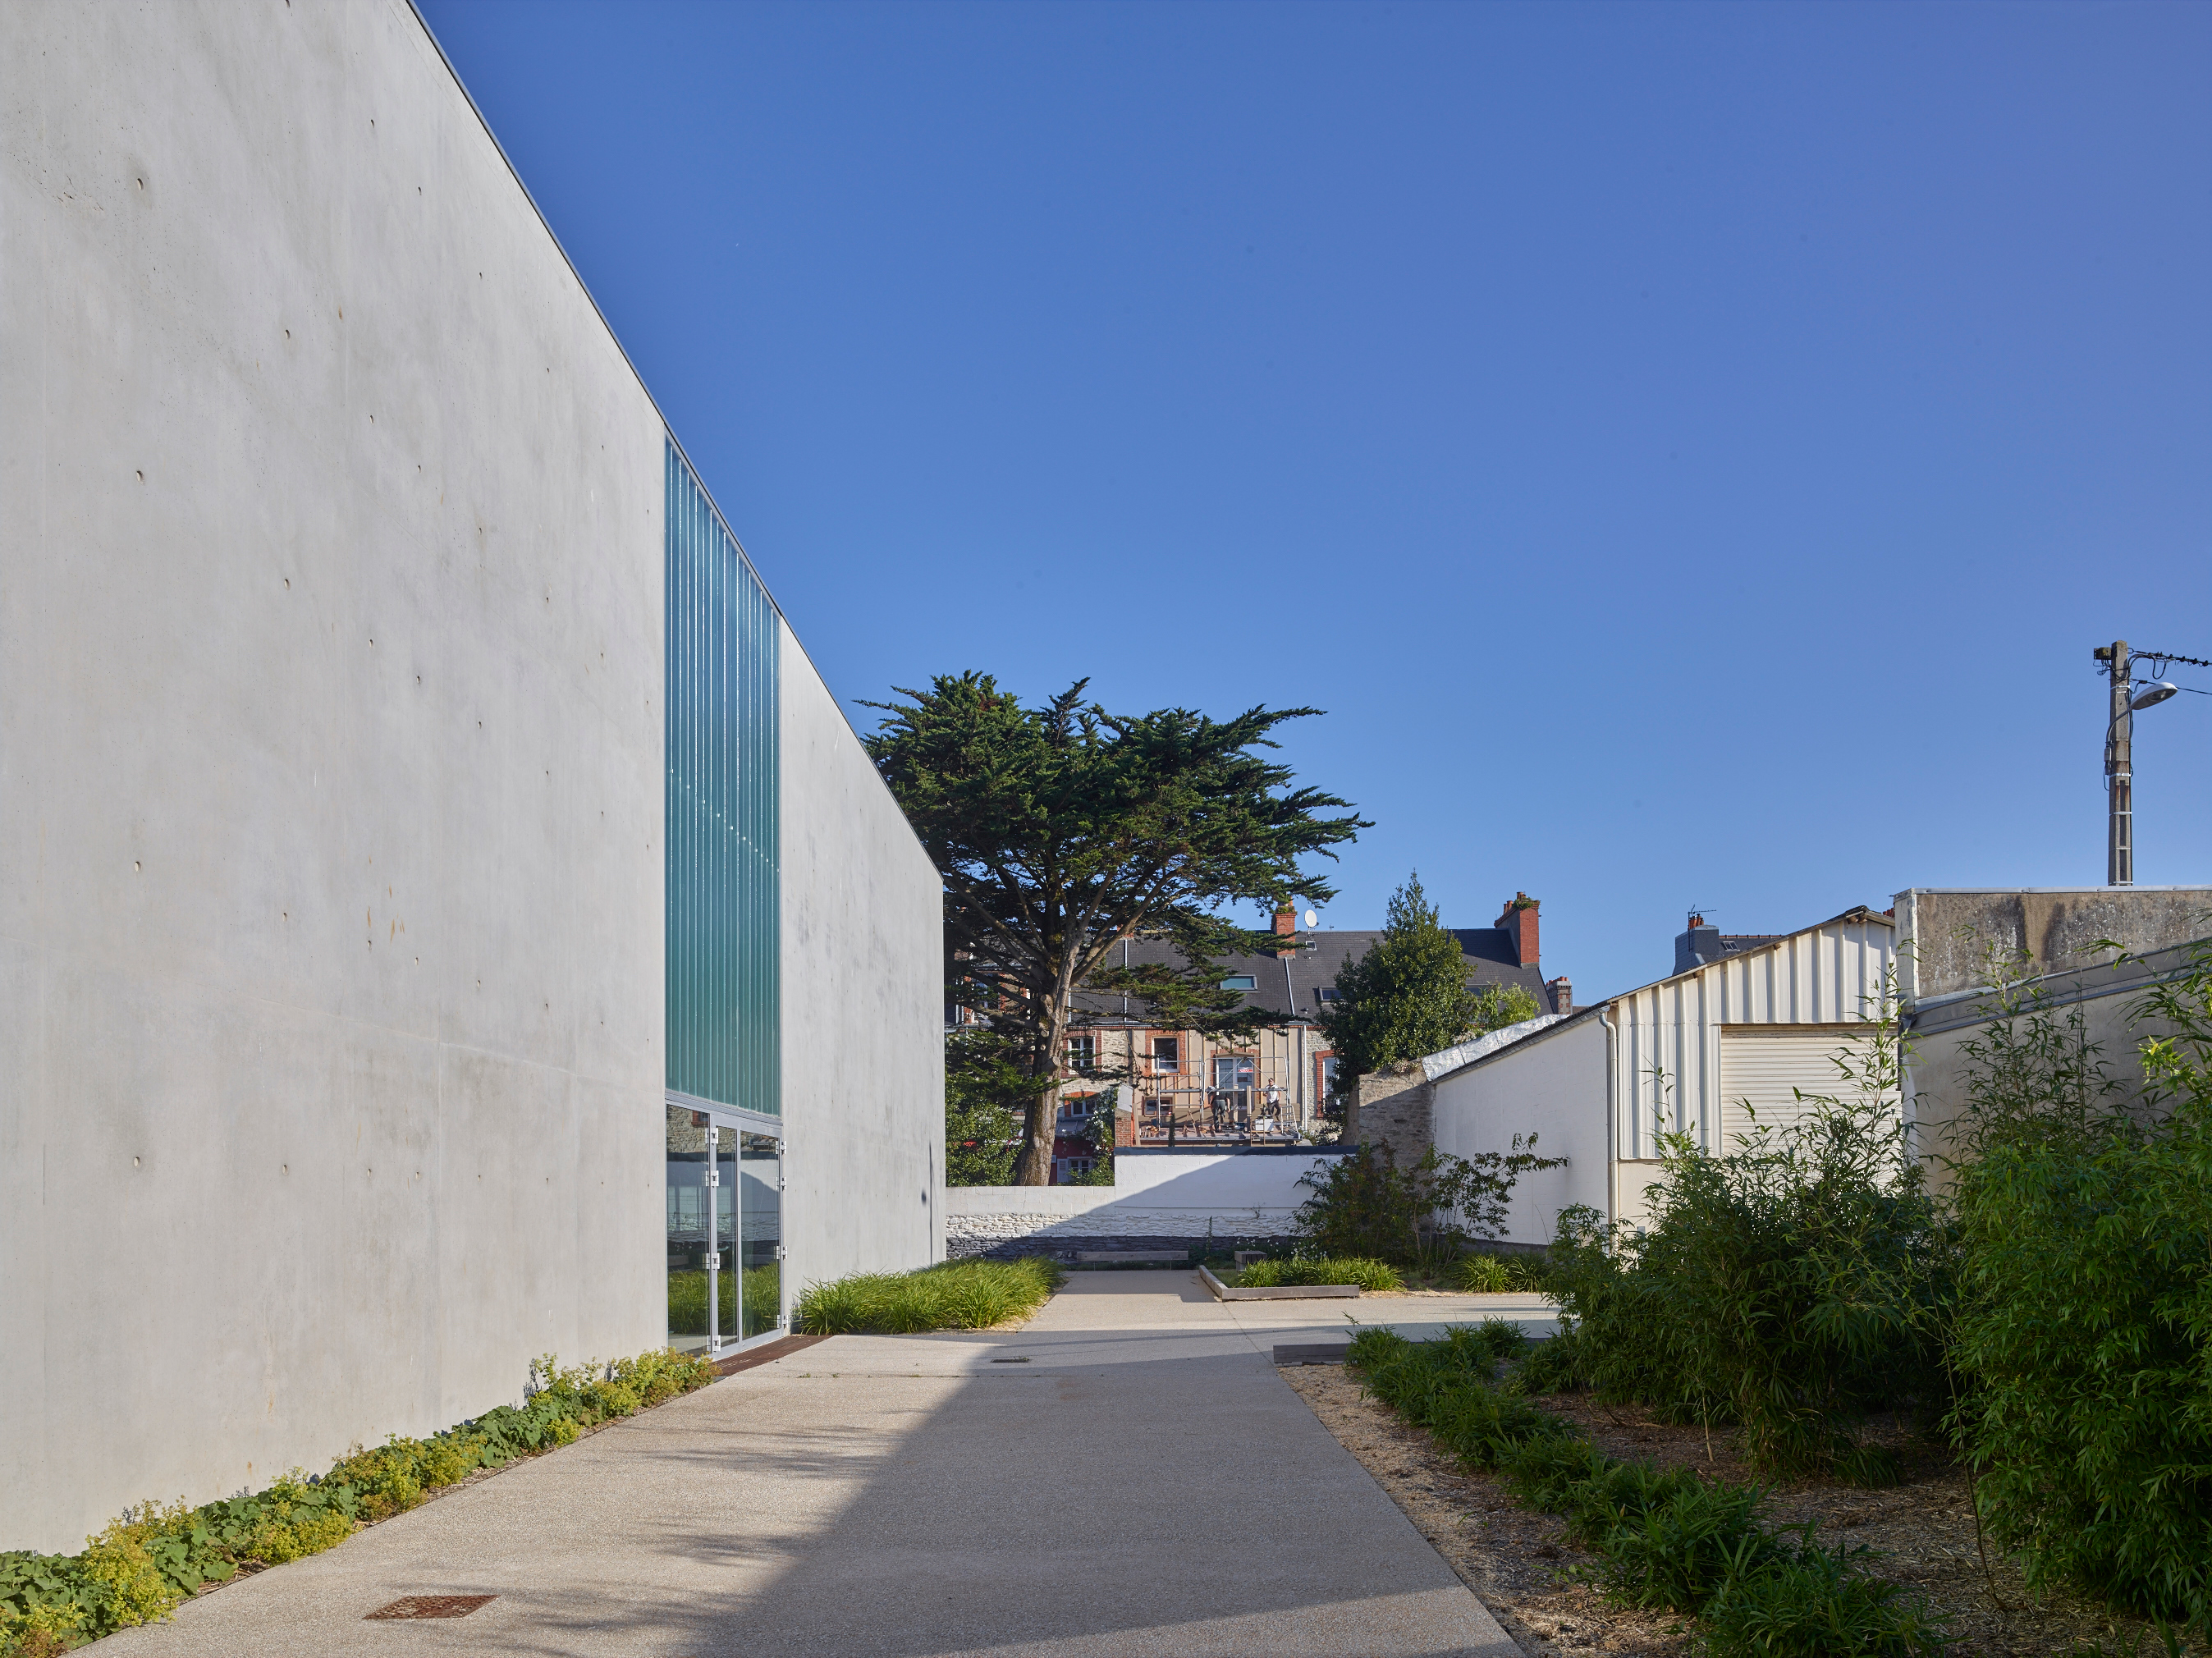 Cherbourg 05 - Salle de gymnastique – Cherbourg